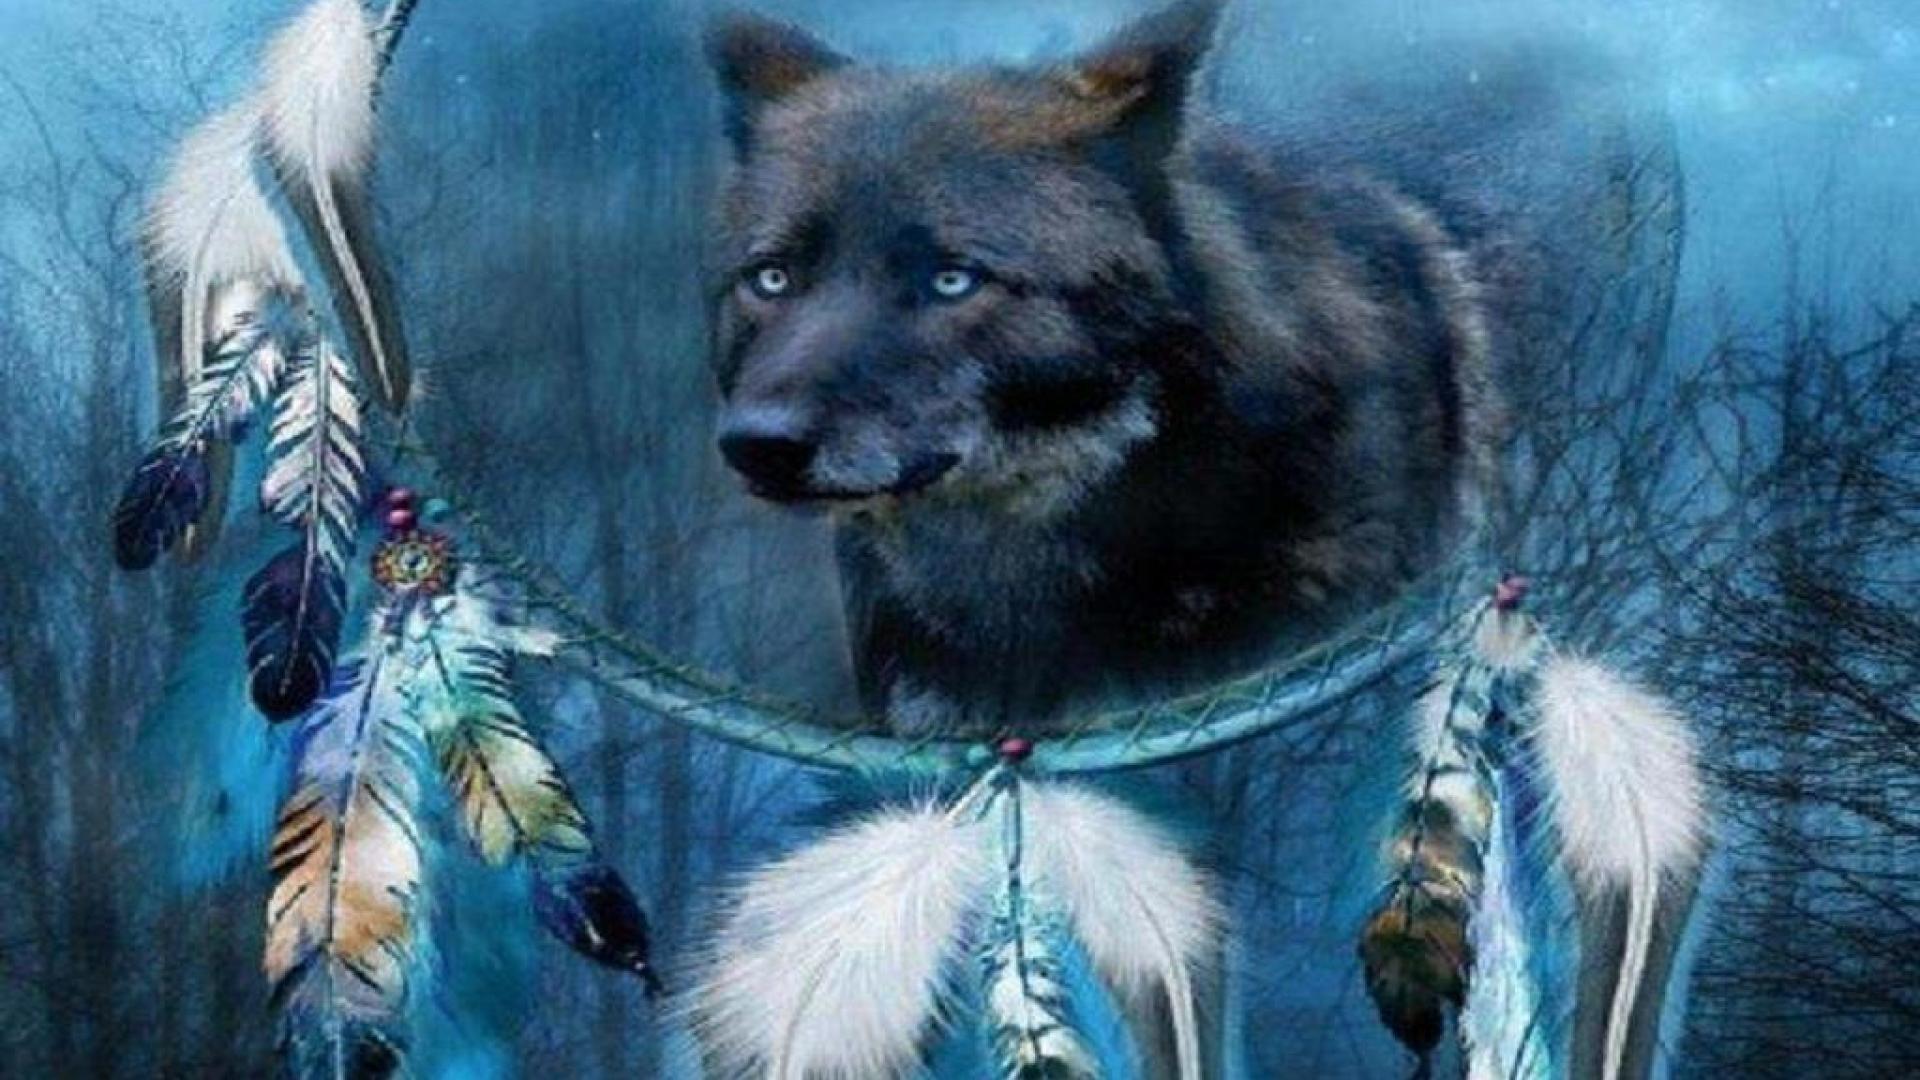 Kira Yukimura  Teen Wolf Wikia  FANDOM powered by Wikia